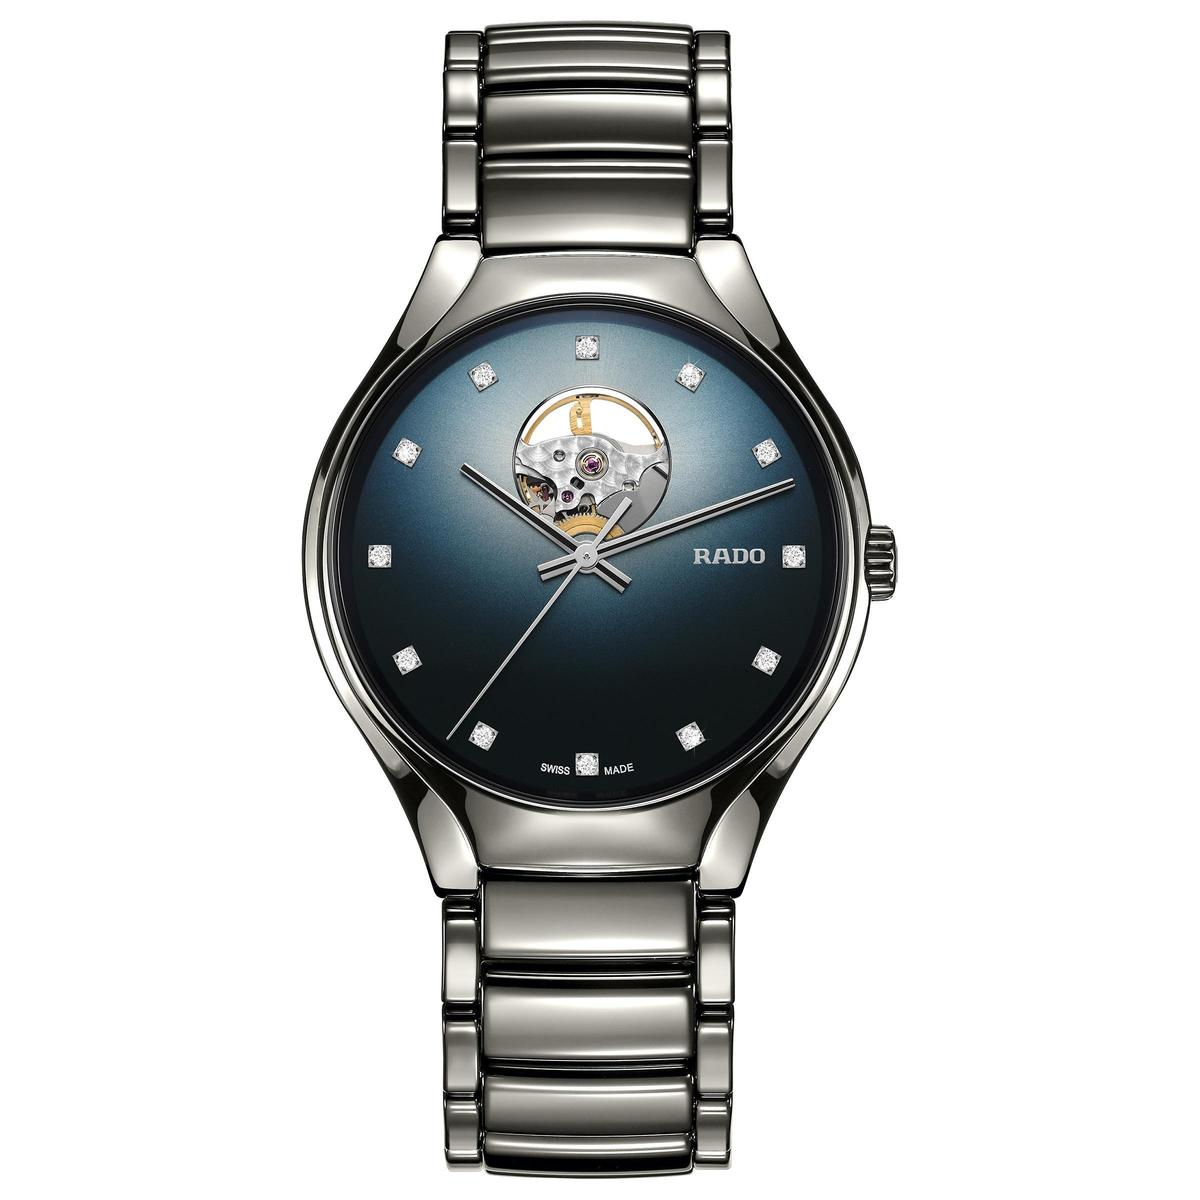 True Secret真我系列秘密鏤空自動腕錶,藍色間層面加上鑲鑽時標,定價NT$74,200。